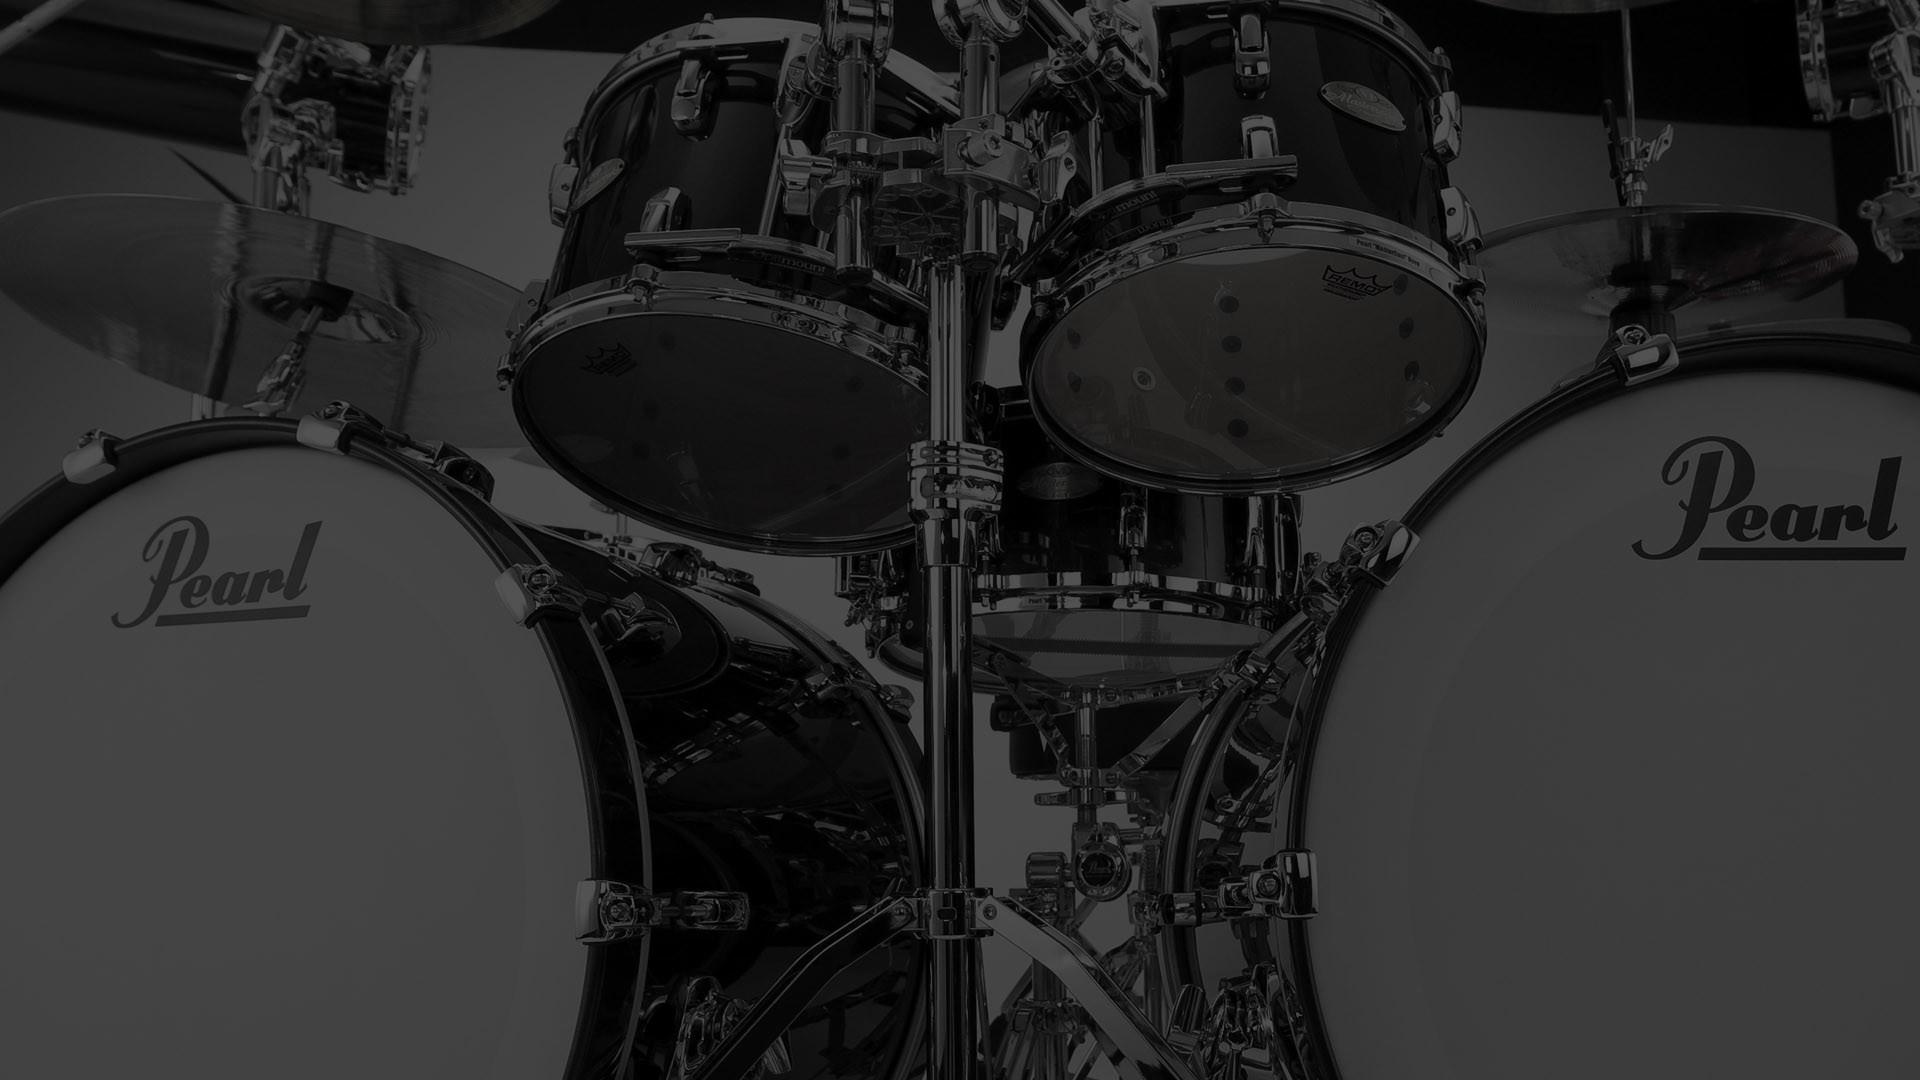 Res: 1920x1080, Pearl Drums